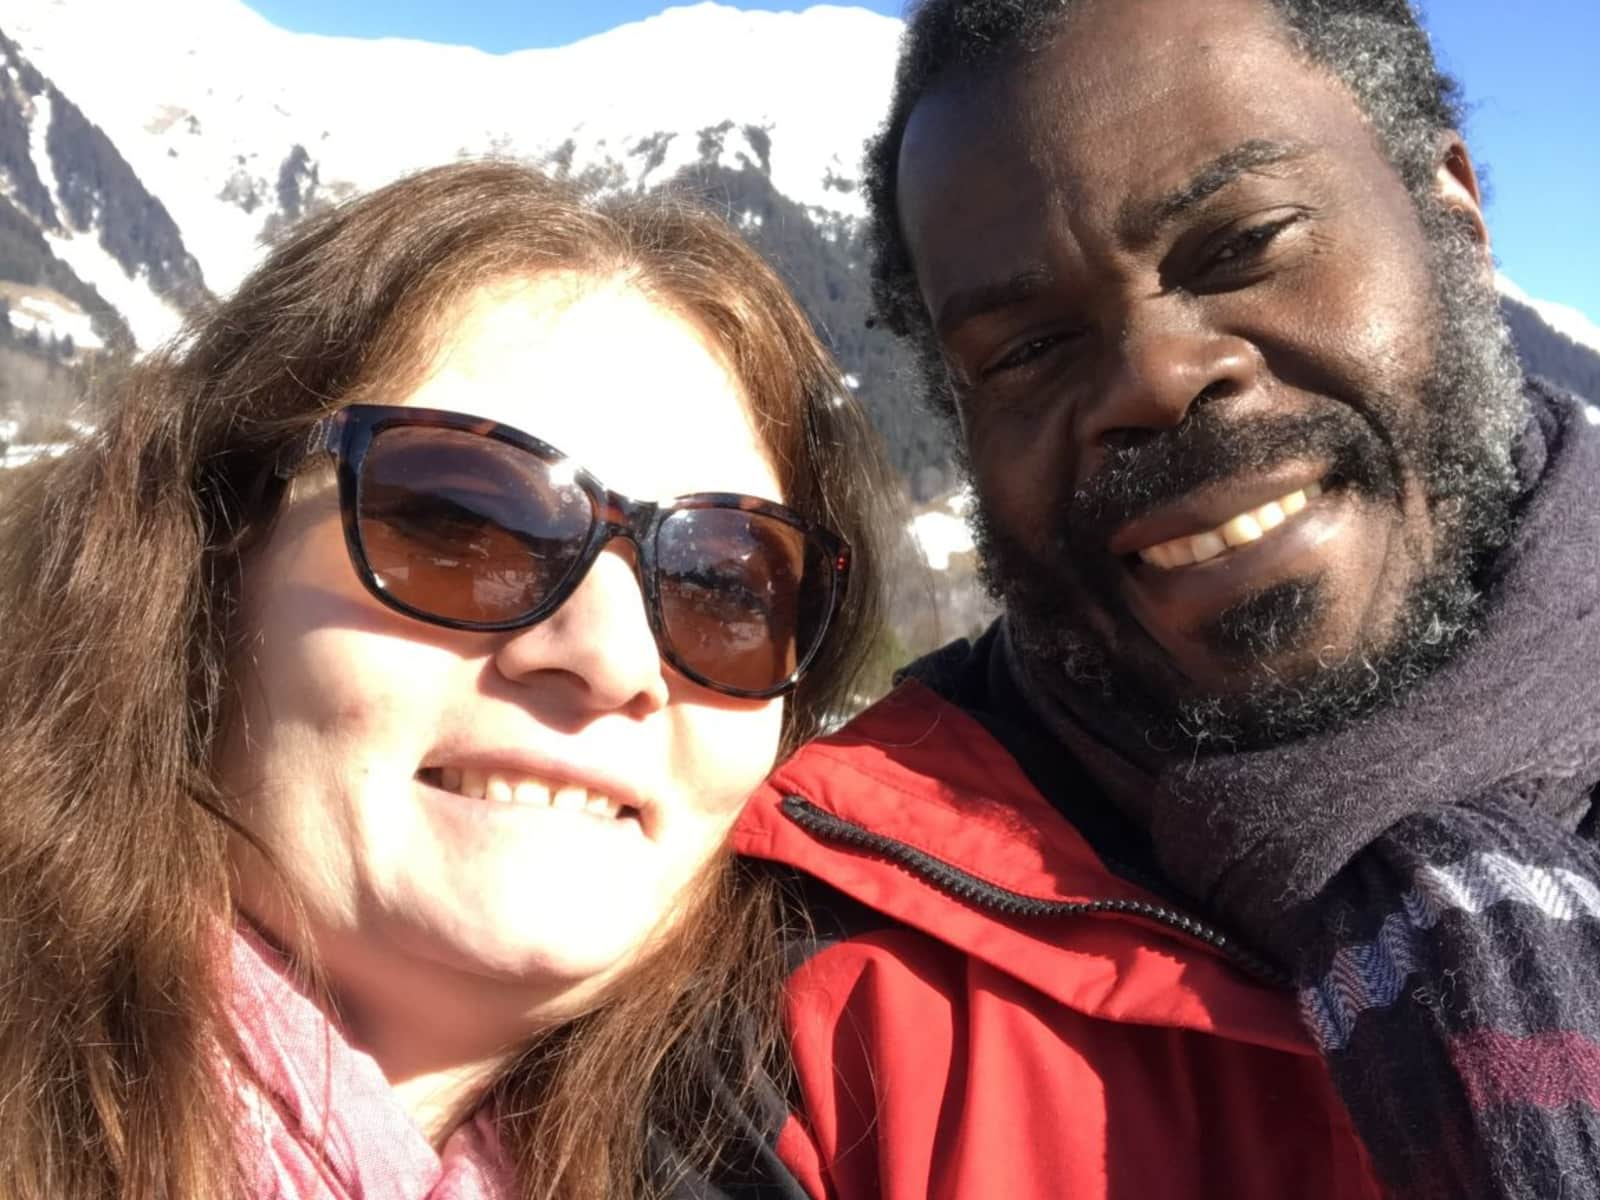 Barbara & Anthony from Wettingen, Switzerland